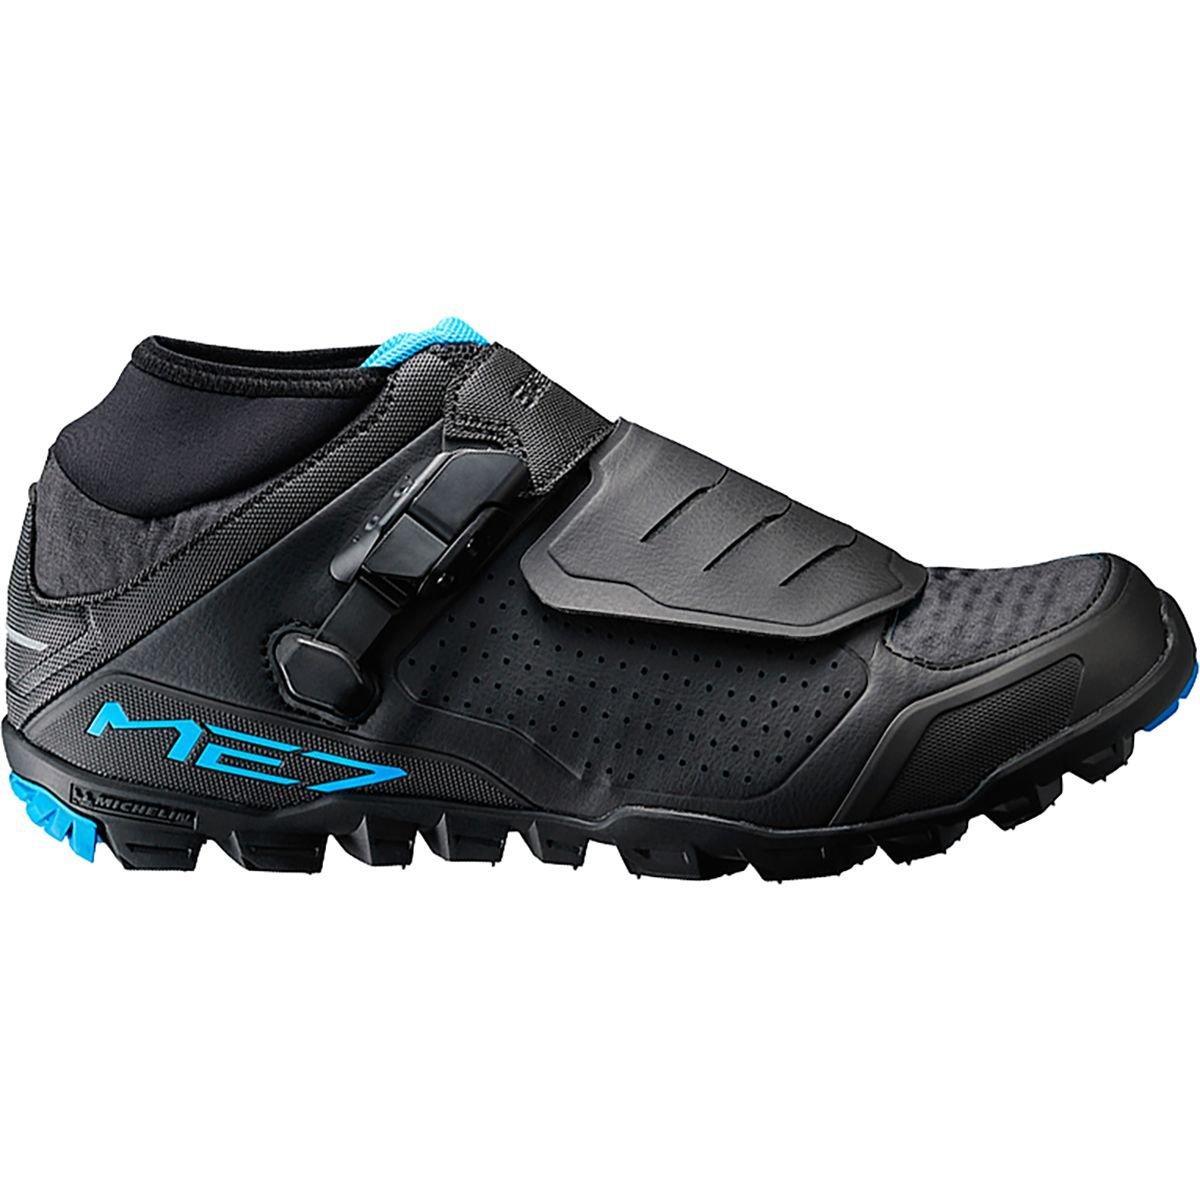 SHIMANO Unisex SH-ME7 Black Sneaker 39 (US Men's 5.8; US Women's 7.2) Medium